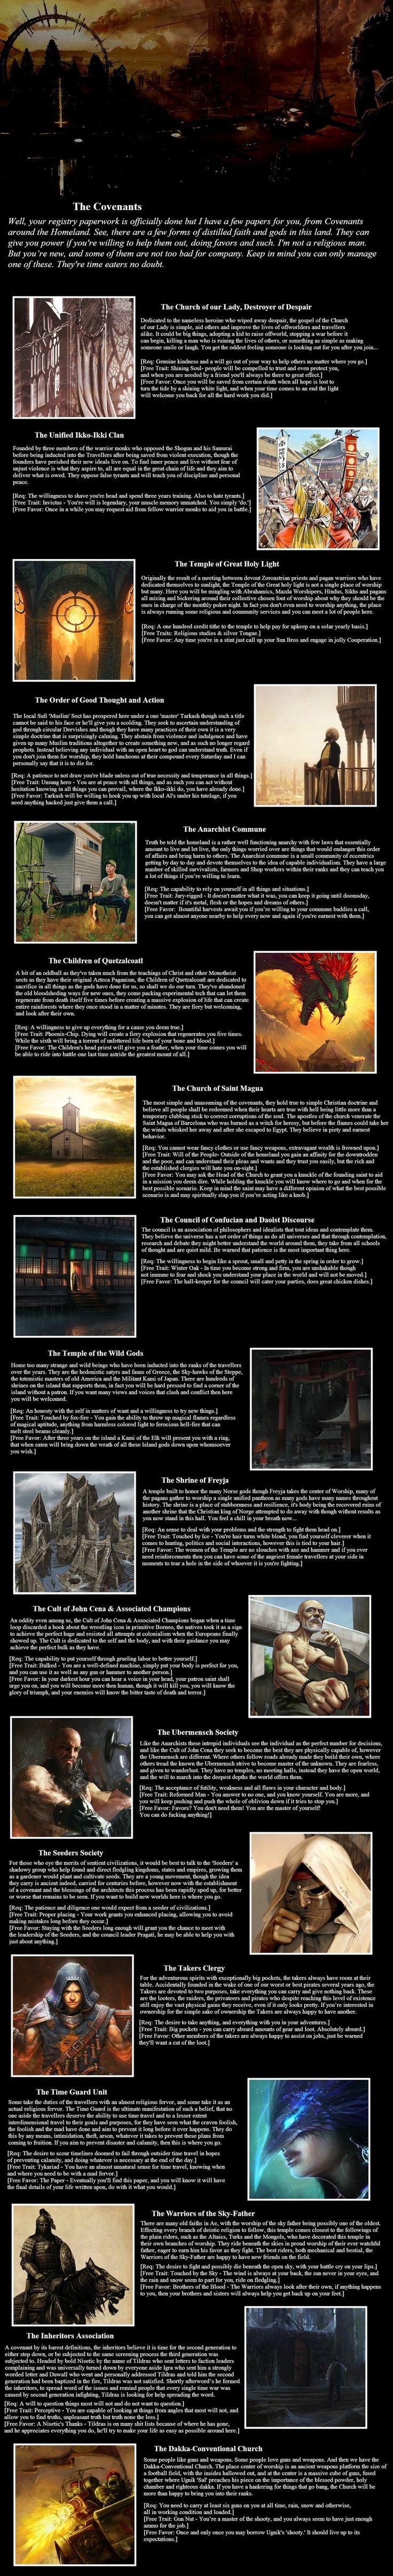 CYOA Traveller's Tale